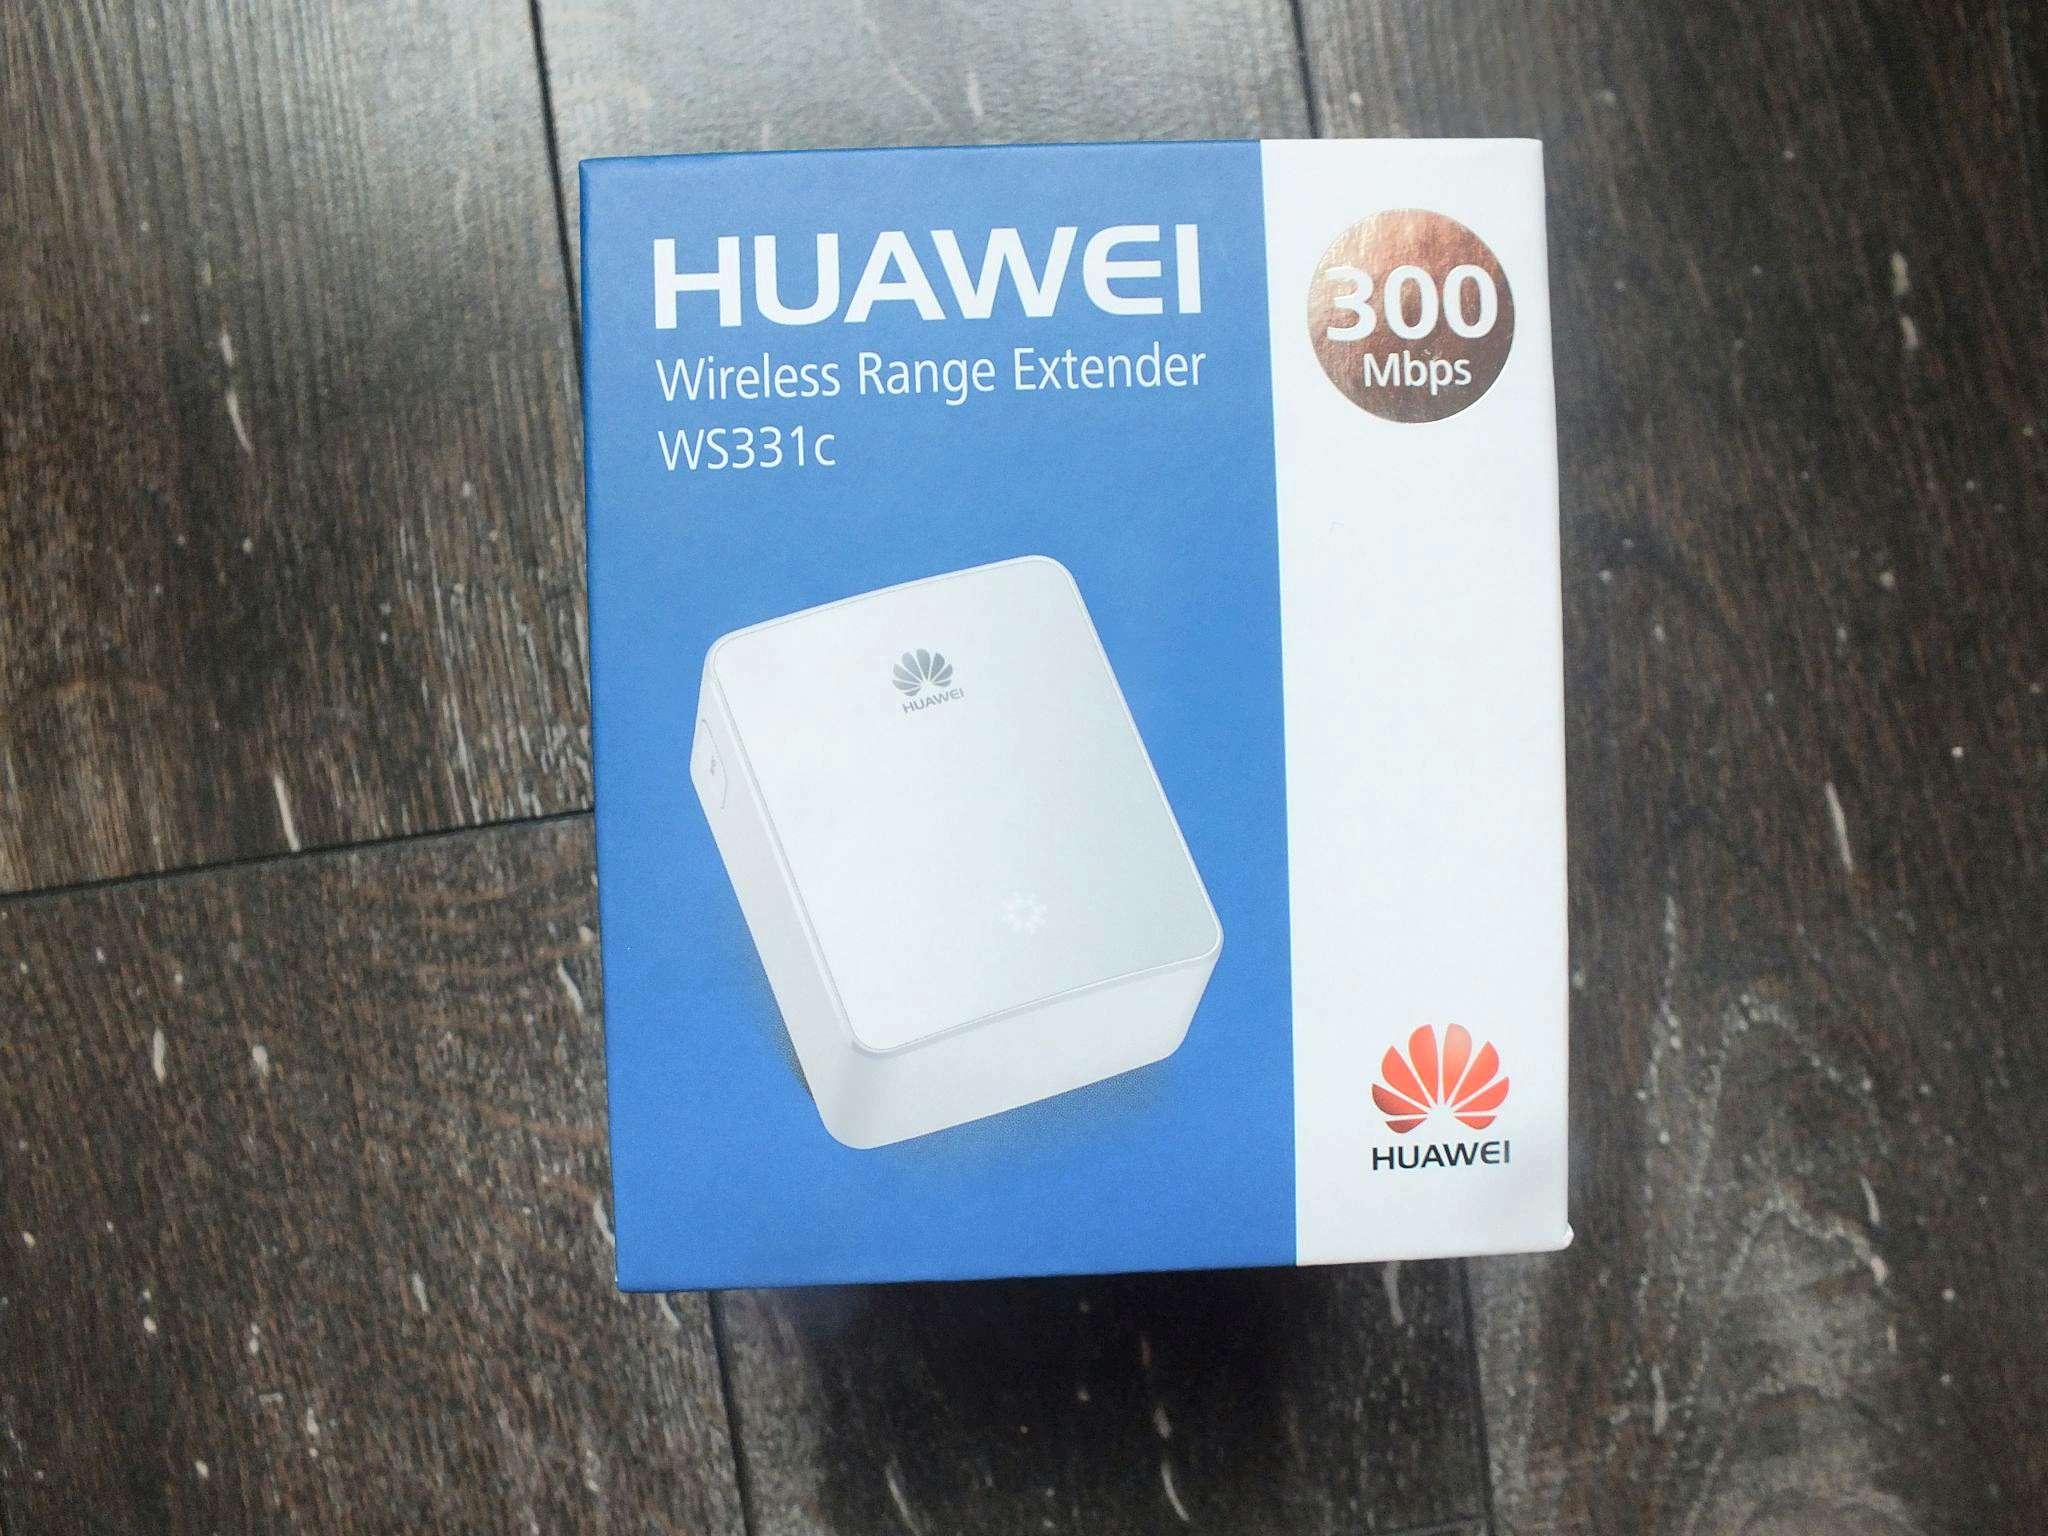 Wi Fi Huawei Ws331c 80211n 24 Ghz 300 Mbps Wireless Range Extender